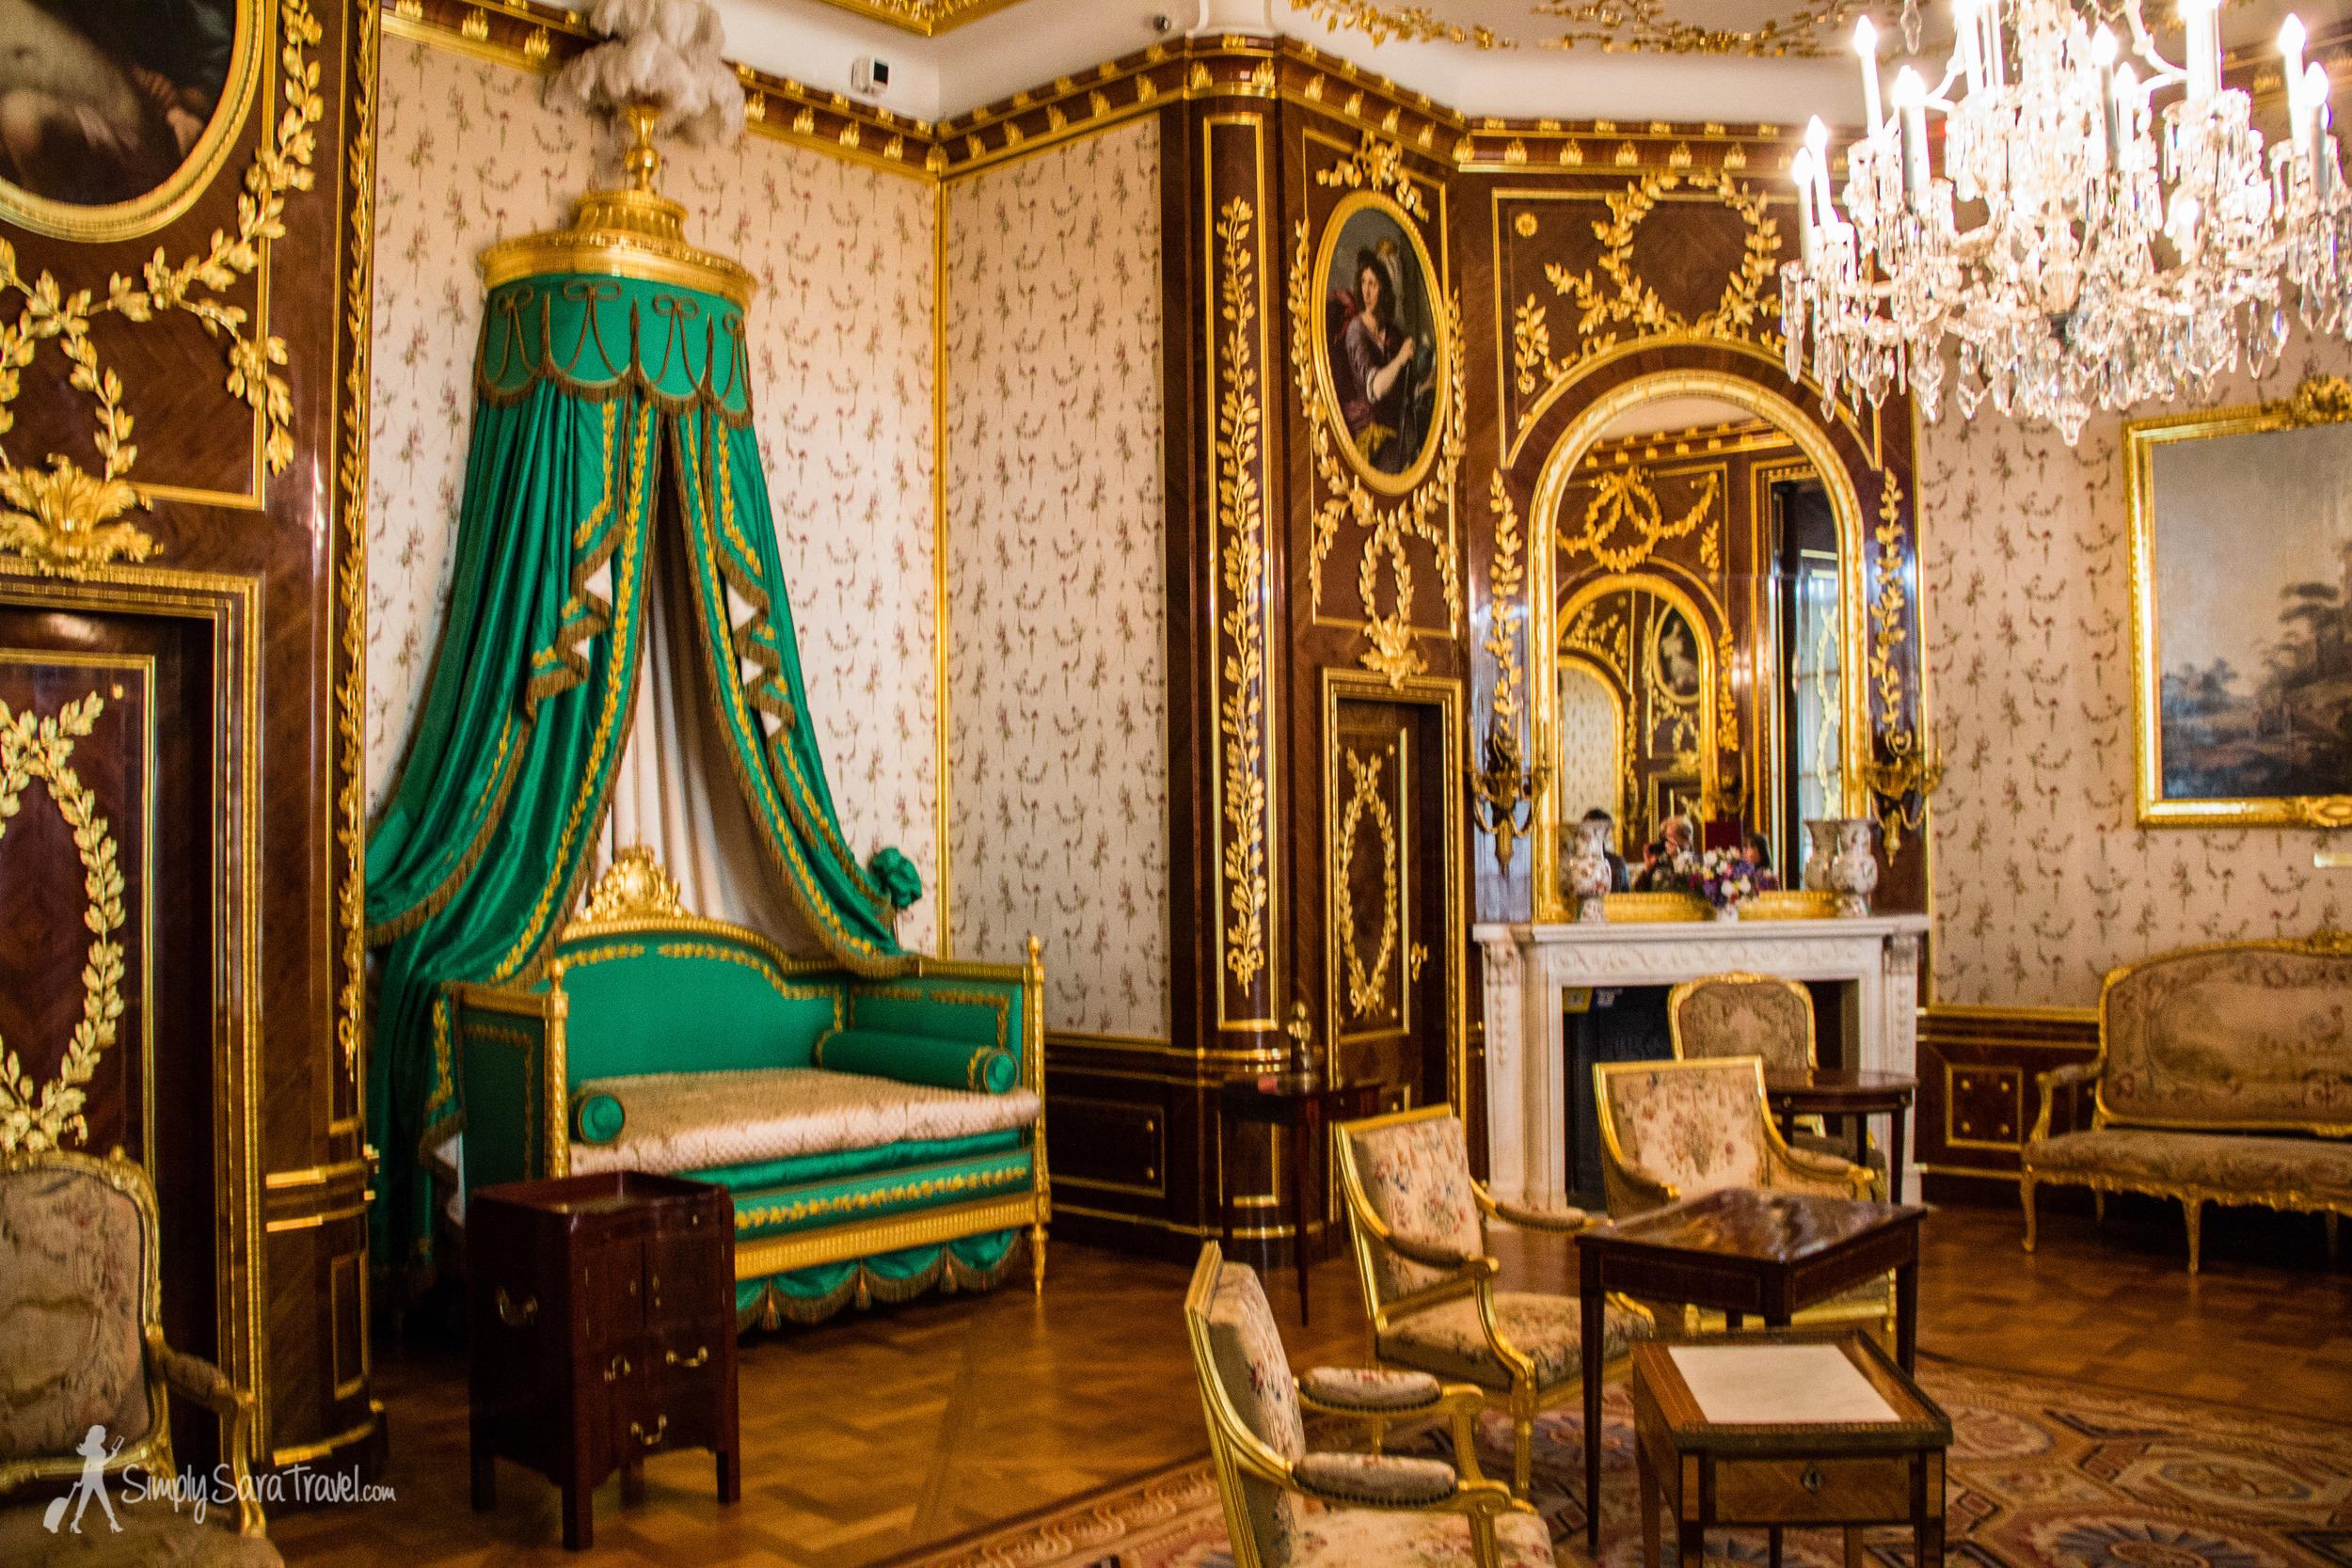 Inside the Royal Castle in Warsaw